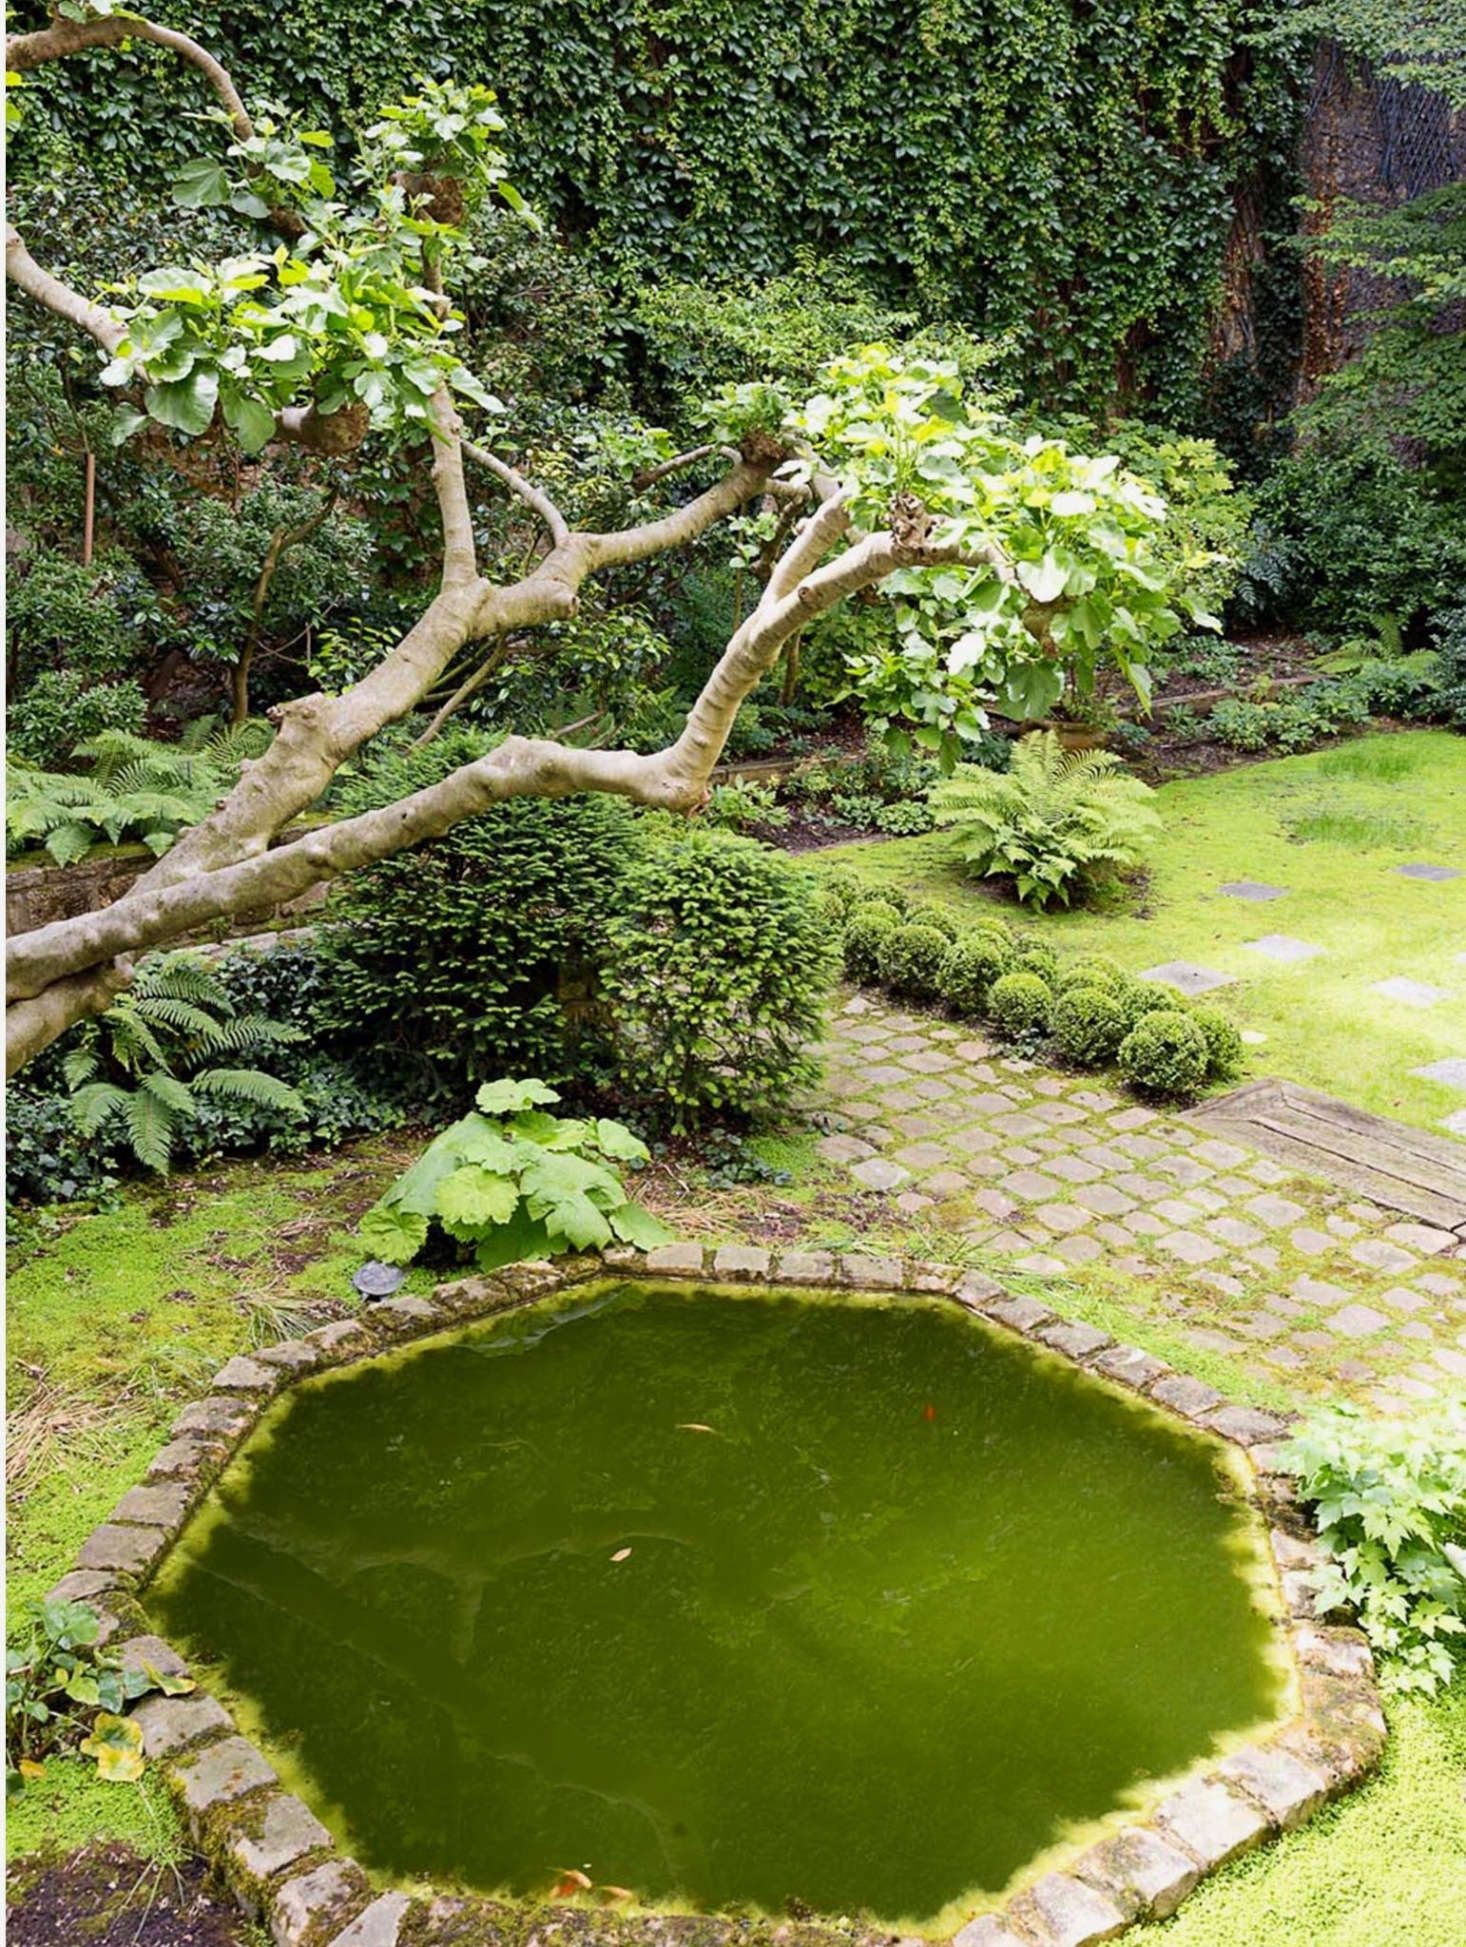 Rudkin designed the octagonal pond. &#8